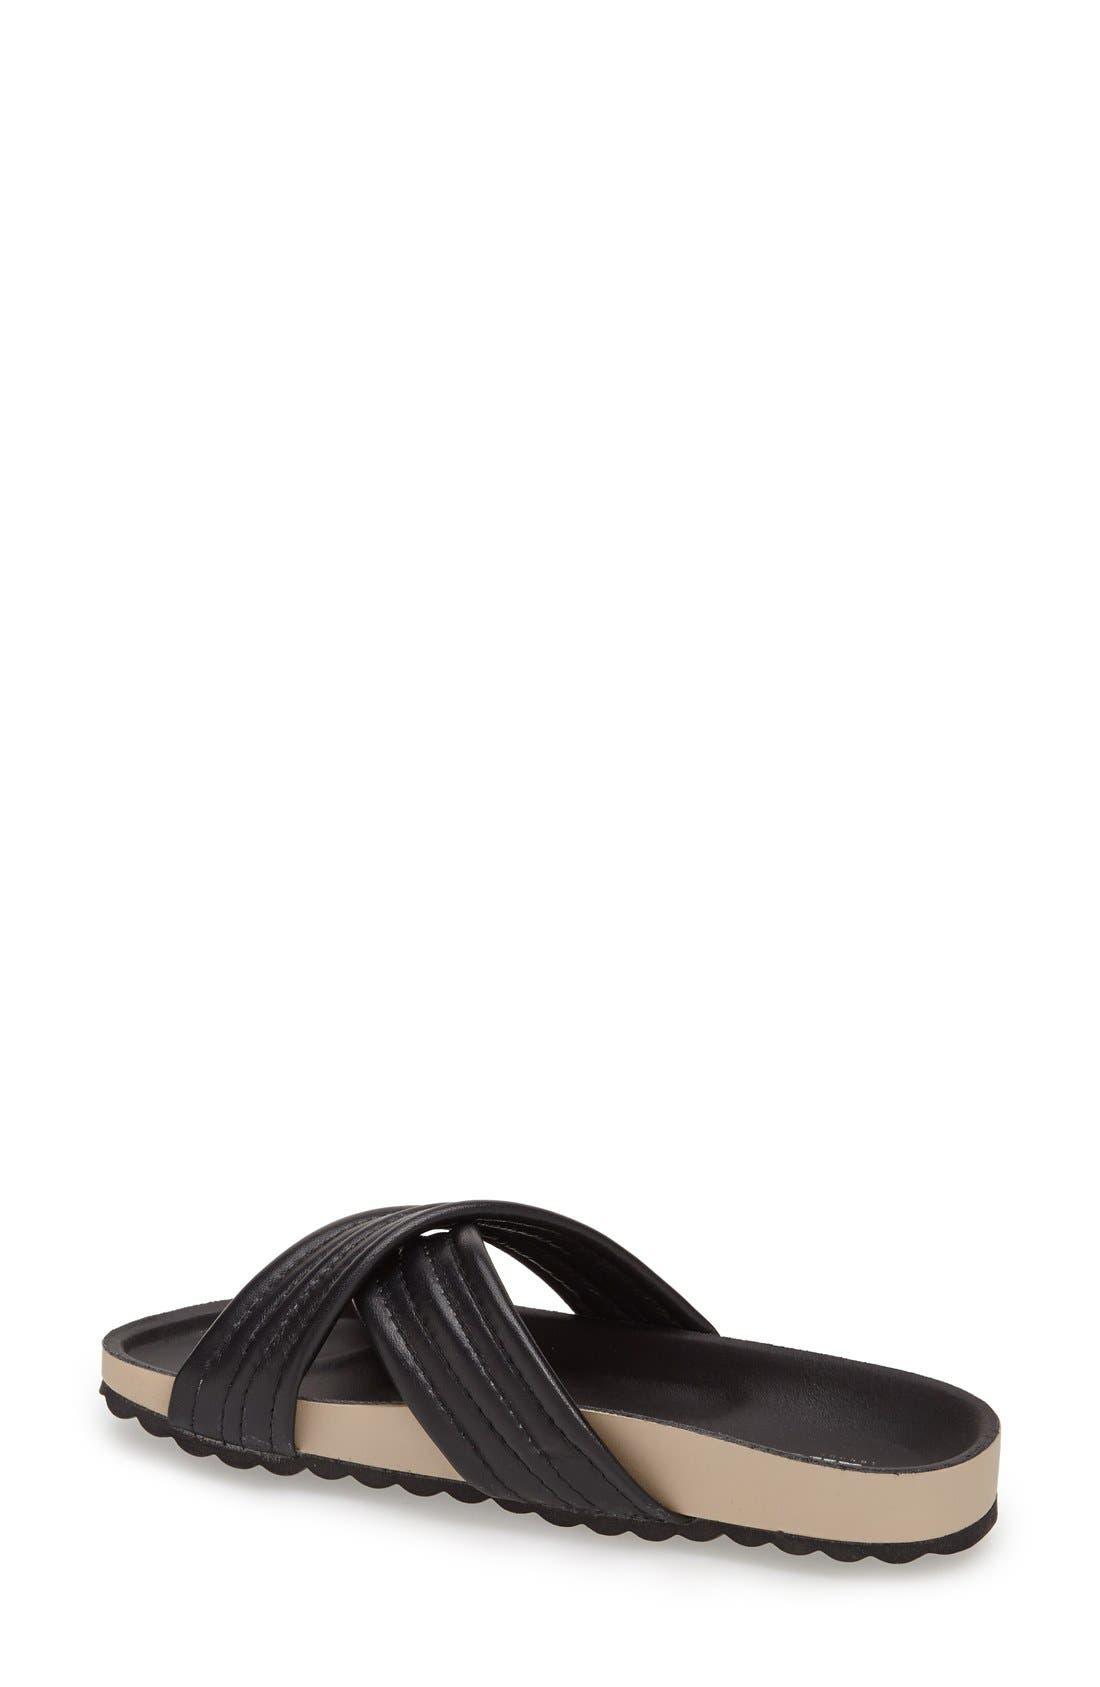 'Jolenes' Leather Slide Sandal,                             Alternate thumbnail 2, color,                             002